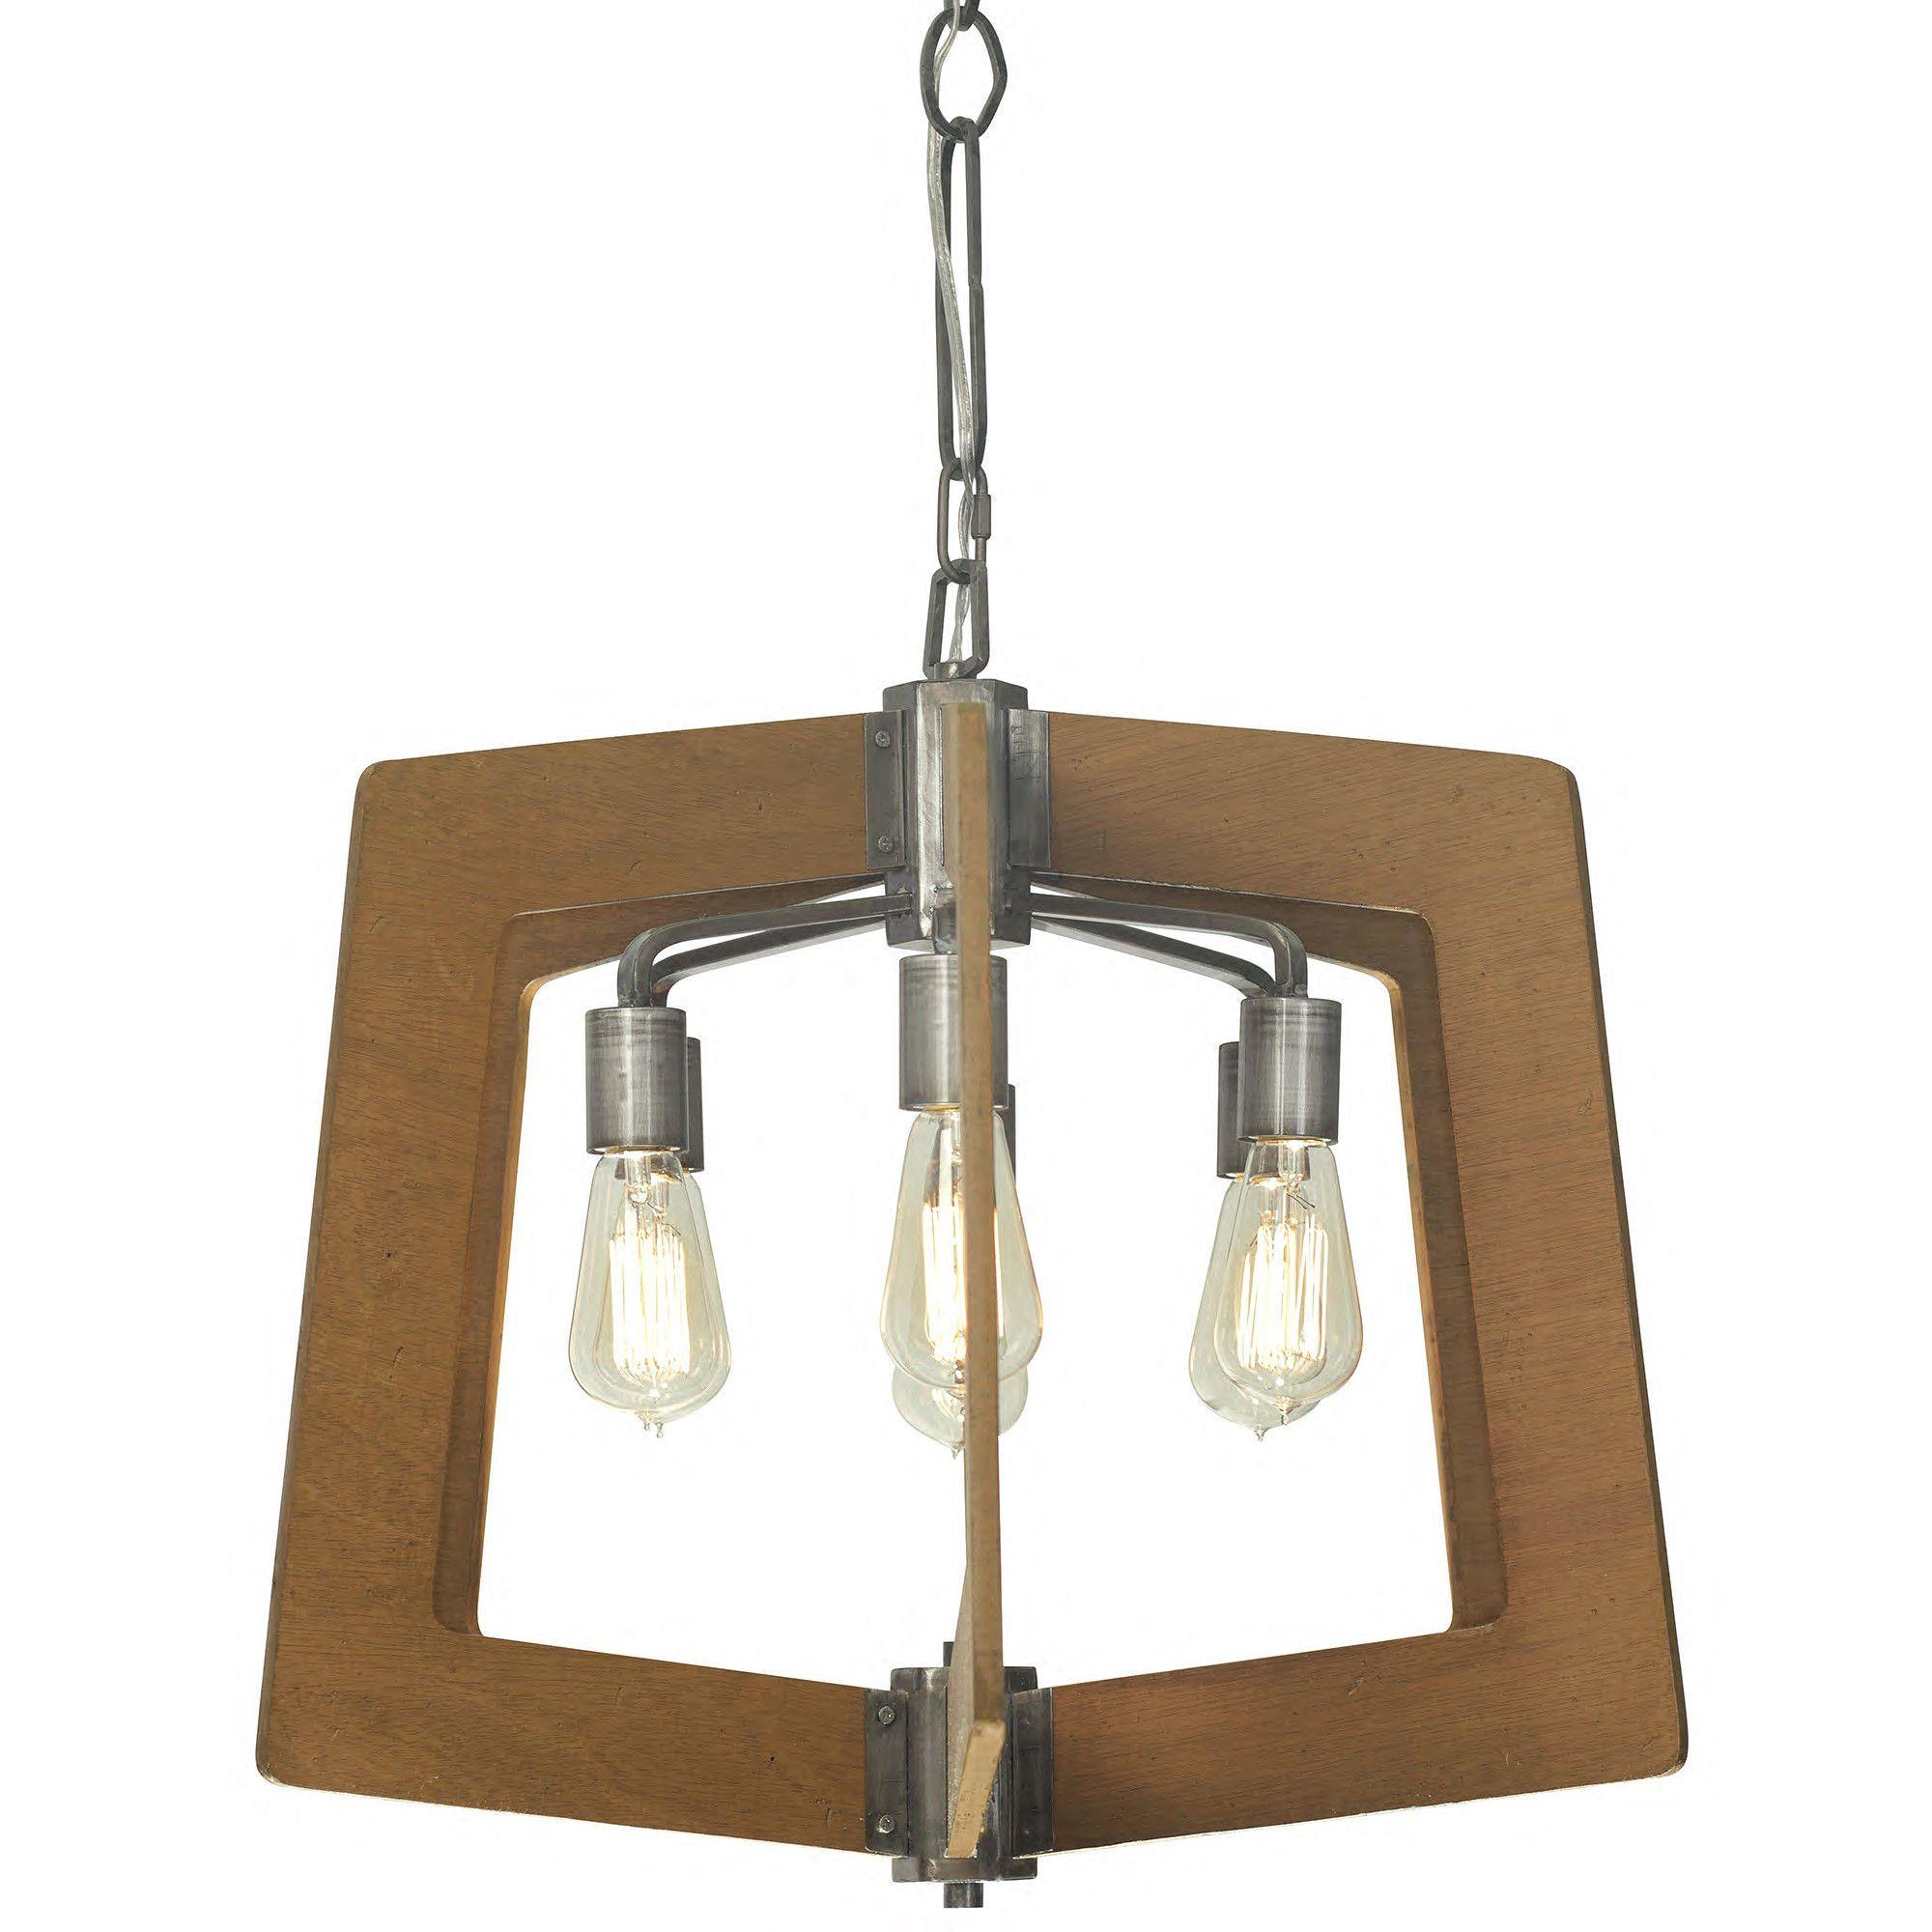 Lofty 6 light mini chandelier products pinterest mini lofty 6 light mini chandelier sputnik aloadofball Gallery